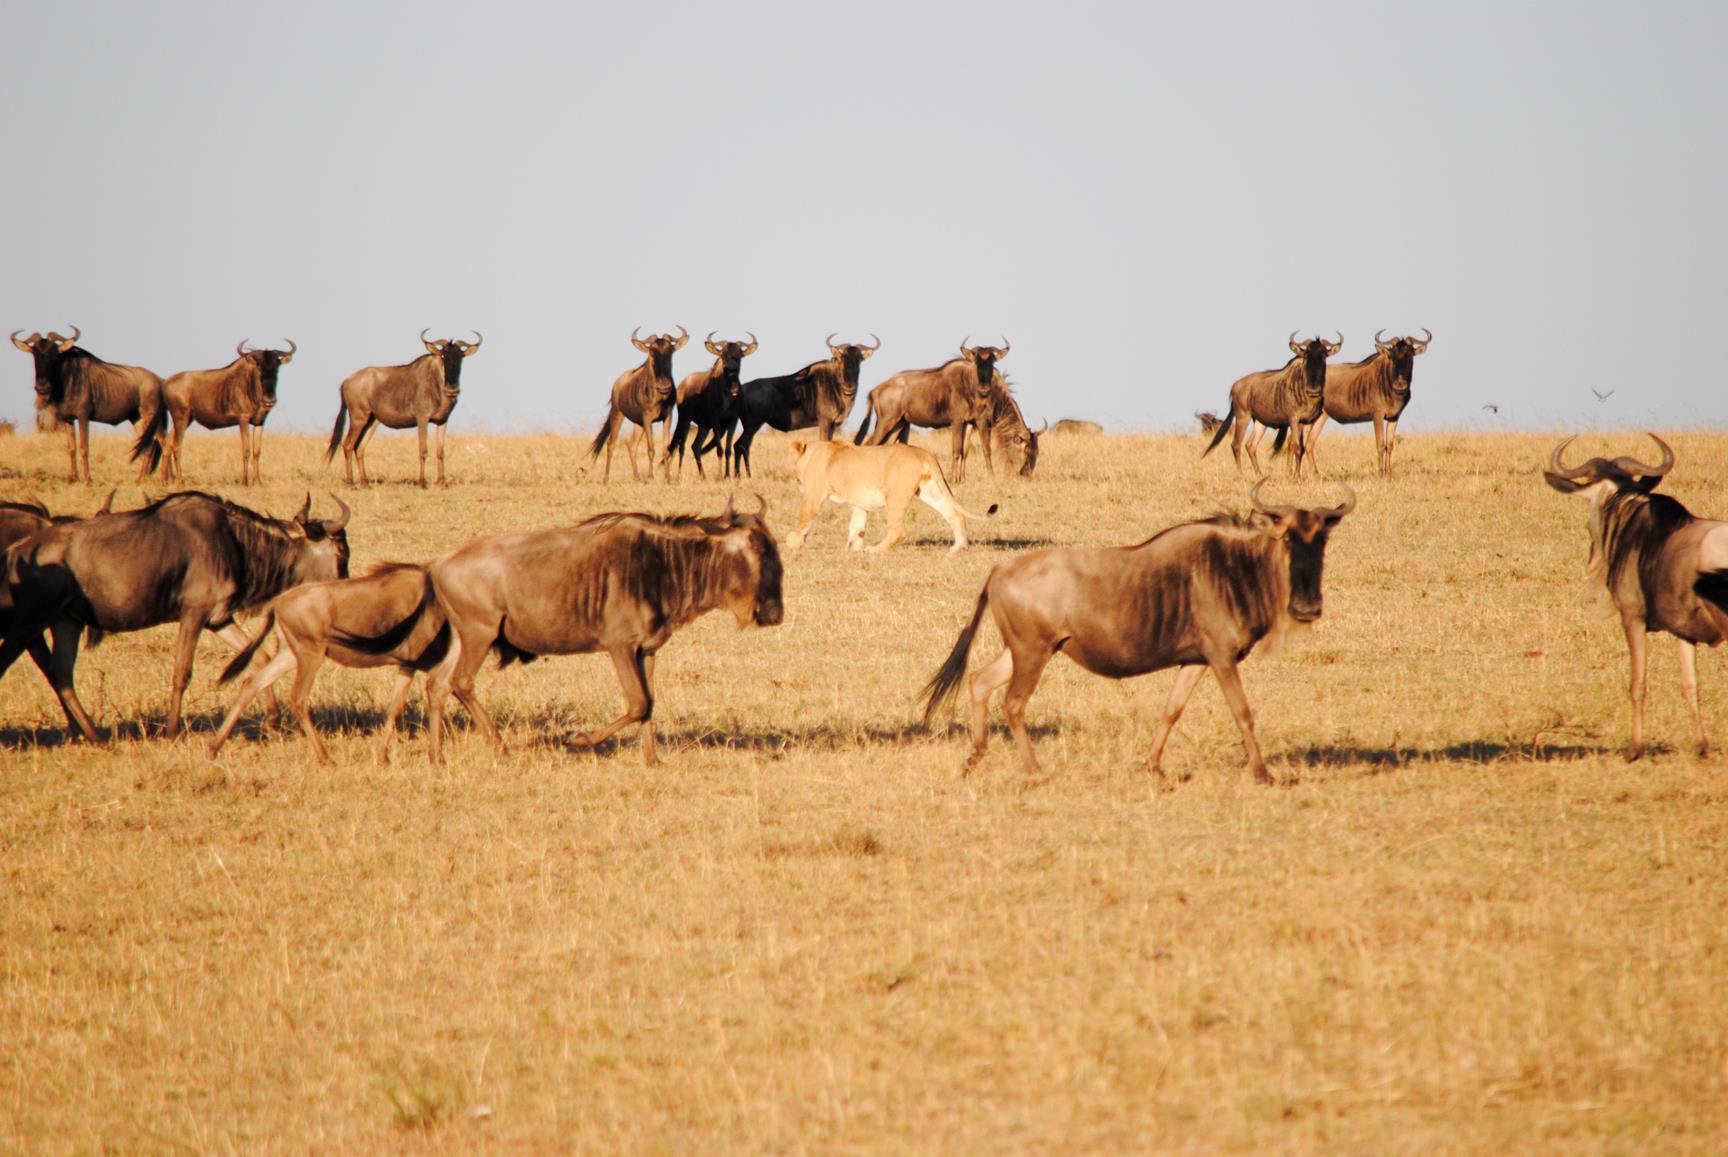 leon-cazando-masai-mara